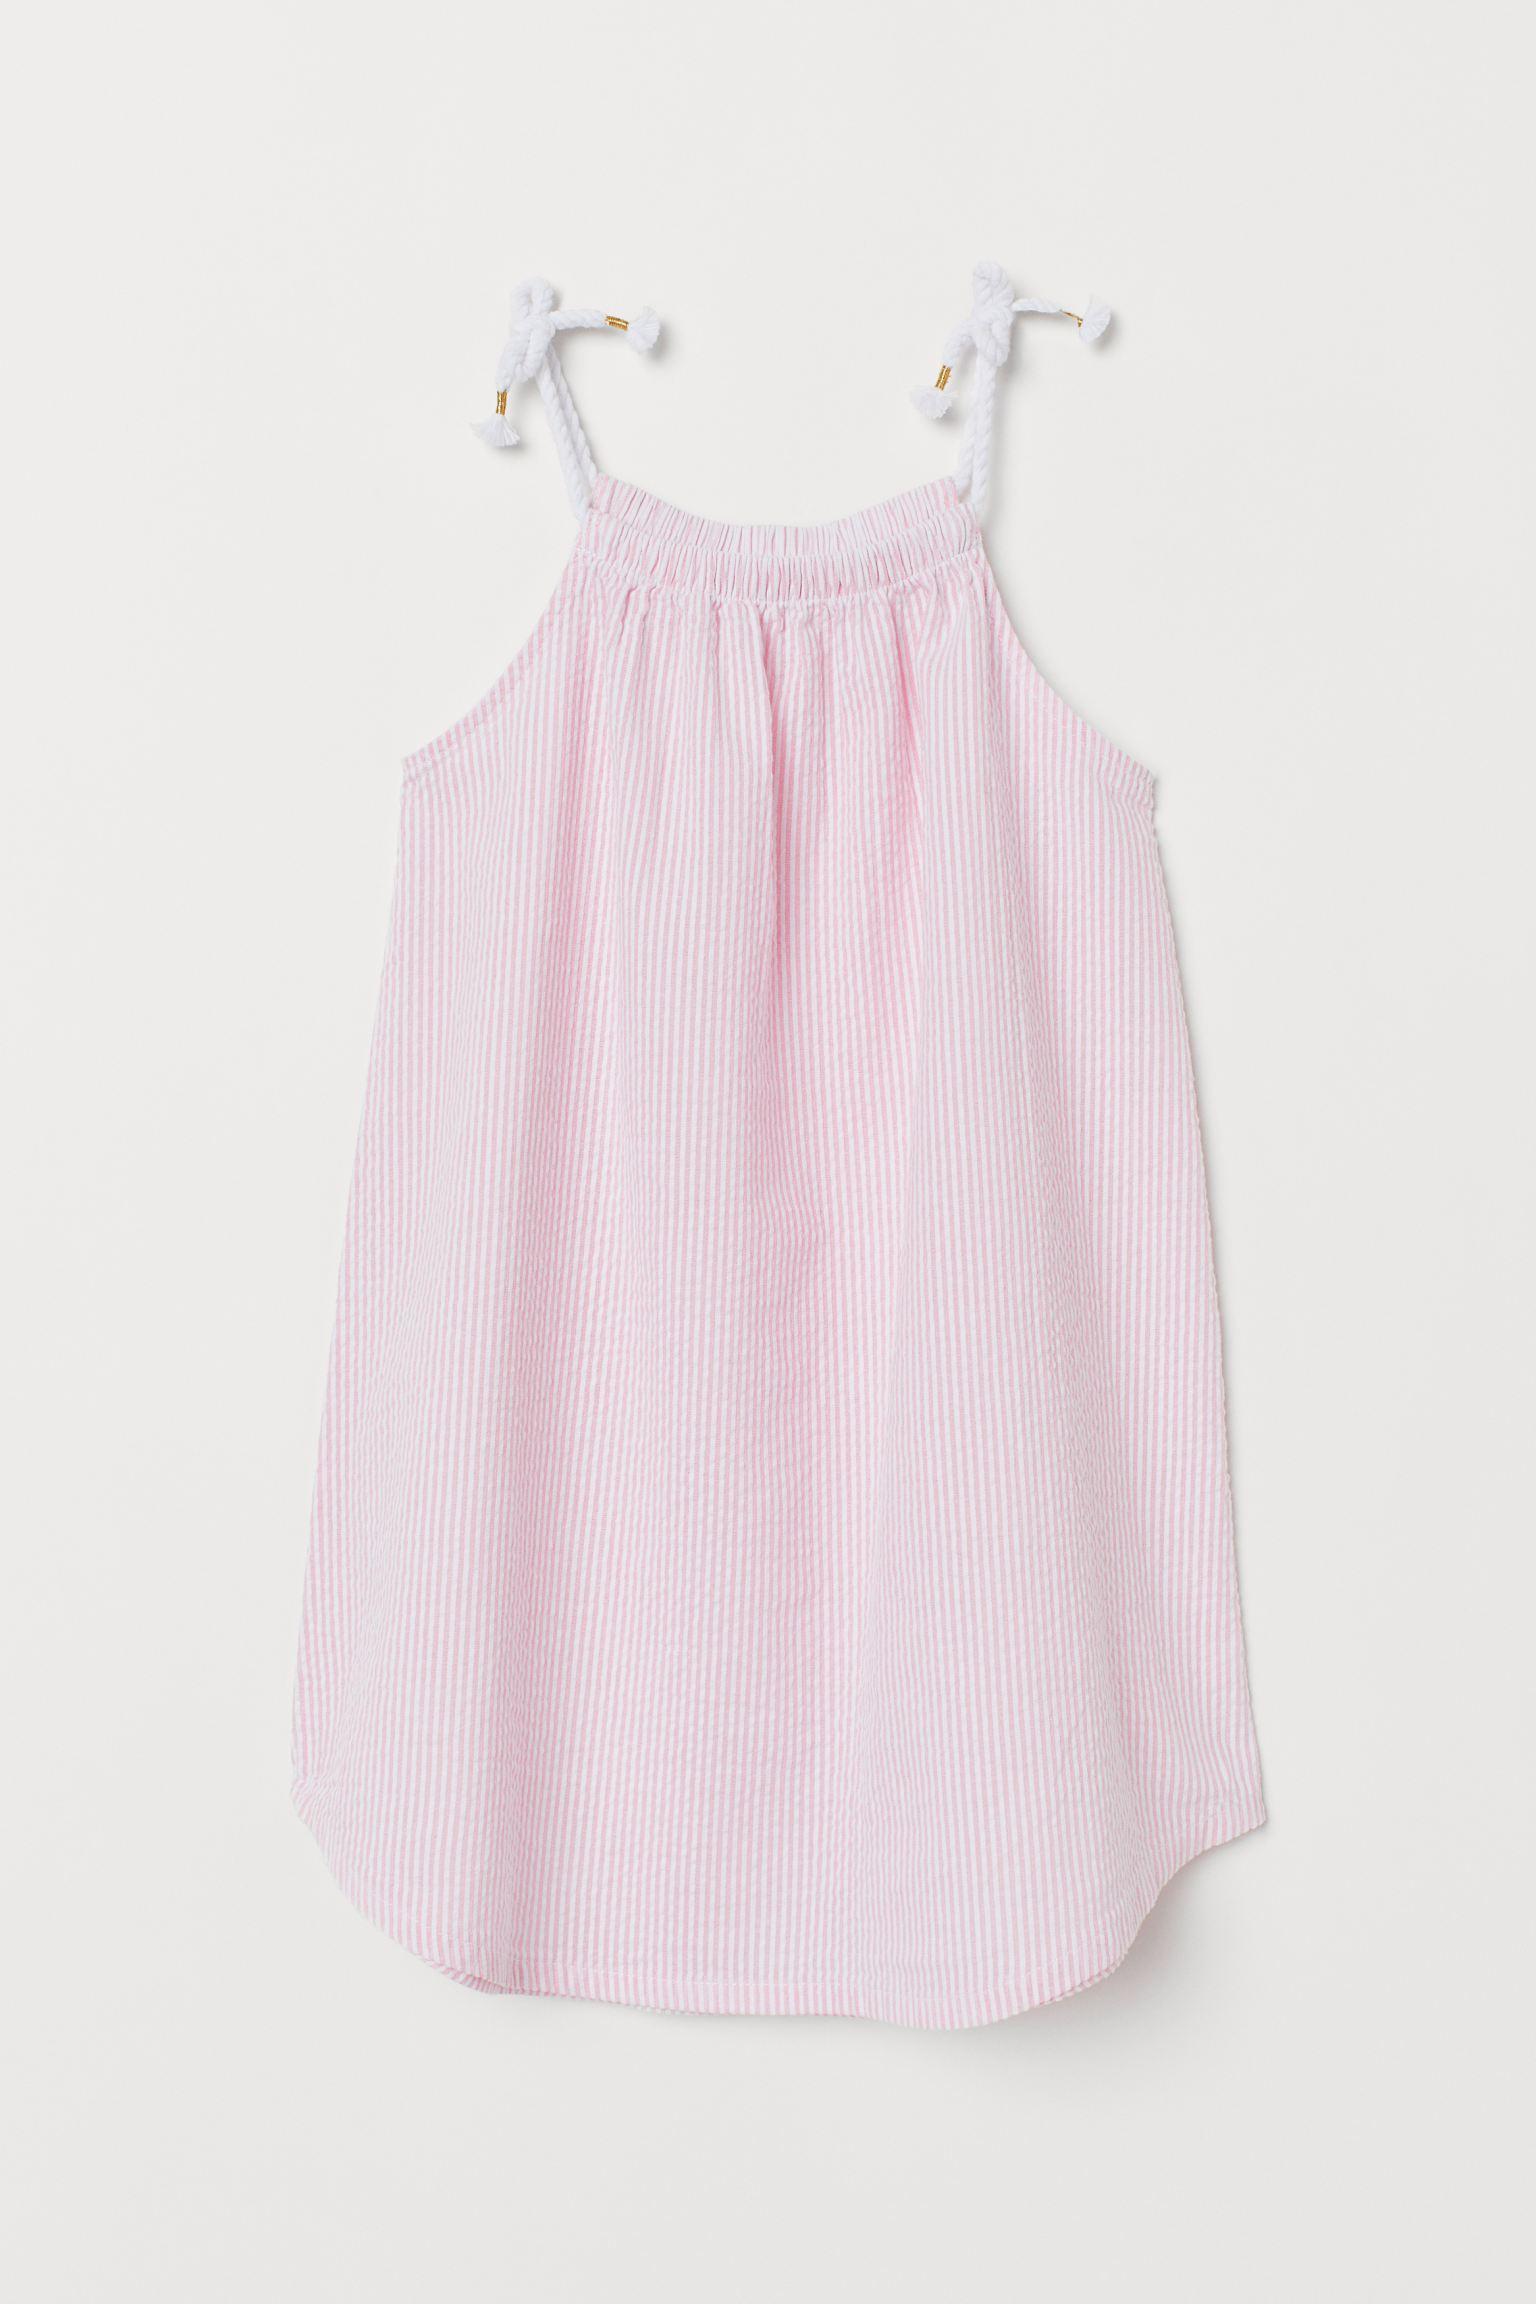 Seersucker Dress Light Pink Striped Kids H M Us